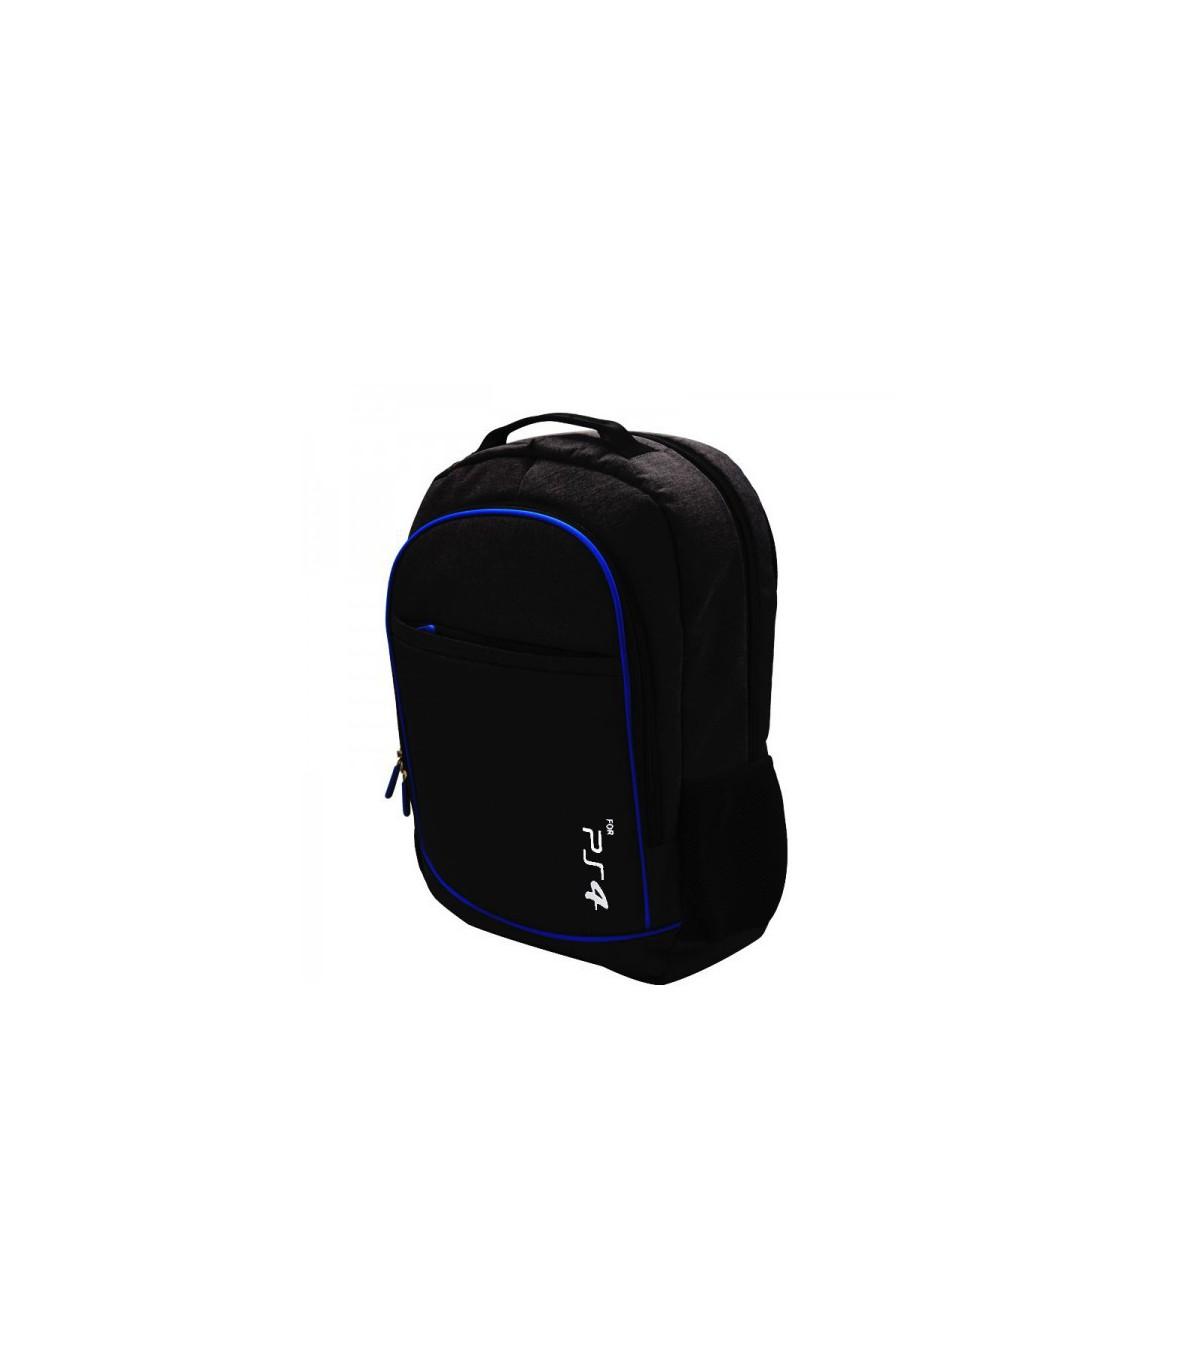 کیف کوله برای حمل پلی استیشن ۴ BackPack Playstation